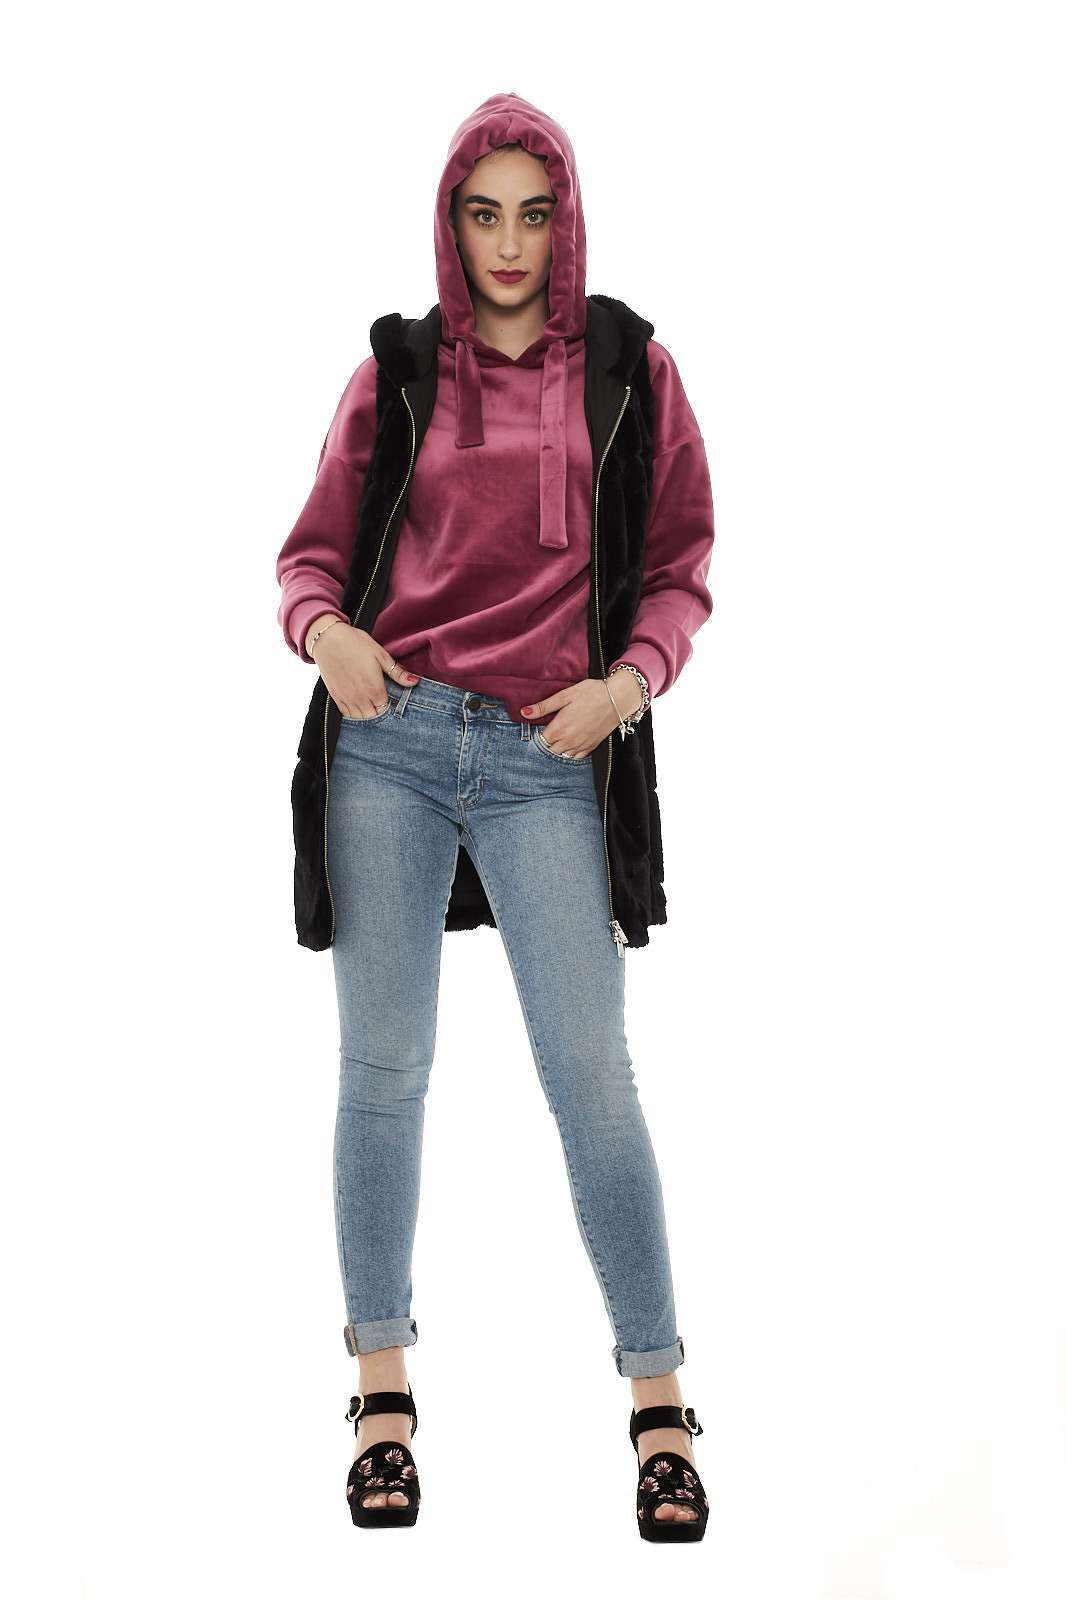 https://www.parmax.com/media/tmp/catalog/product/a/i/ai-outlet_parmax-pelliccia-donna-only-newmartin-e.jpg